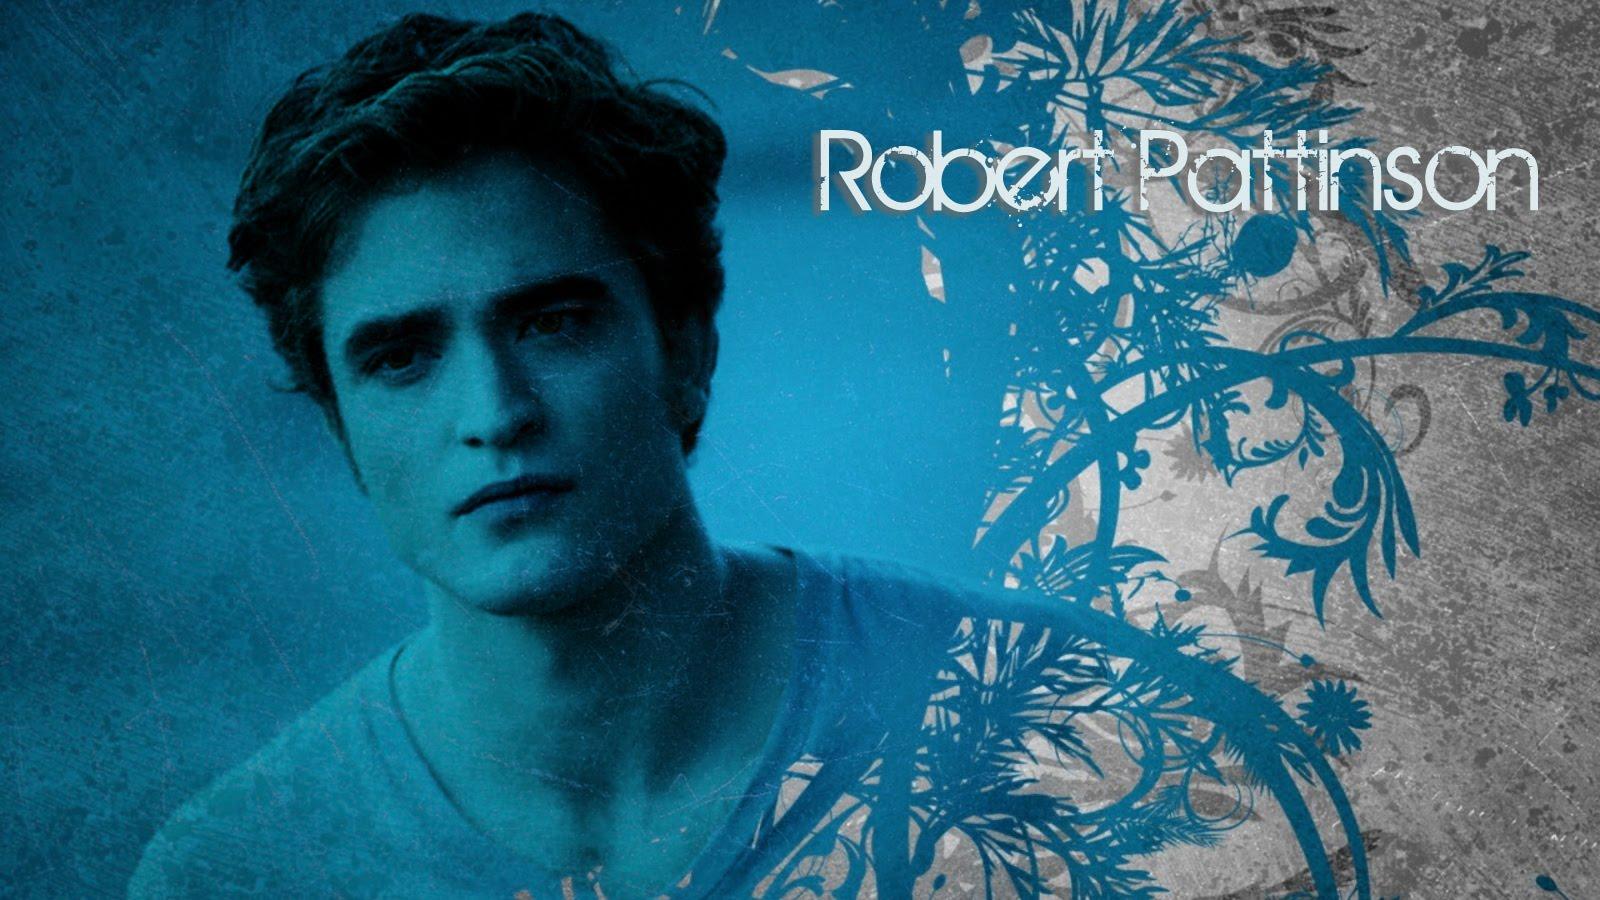 The Unbuttoned Collection Robert Pattinson Desktop